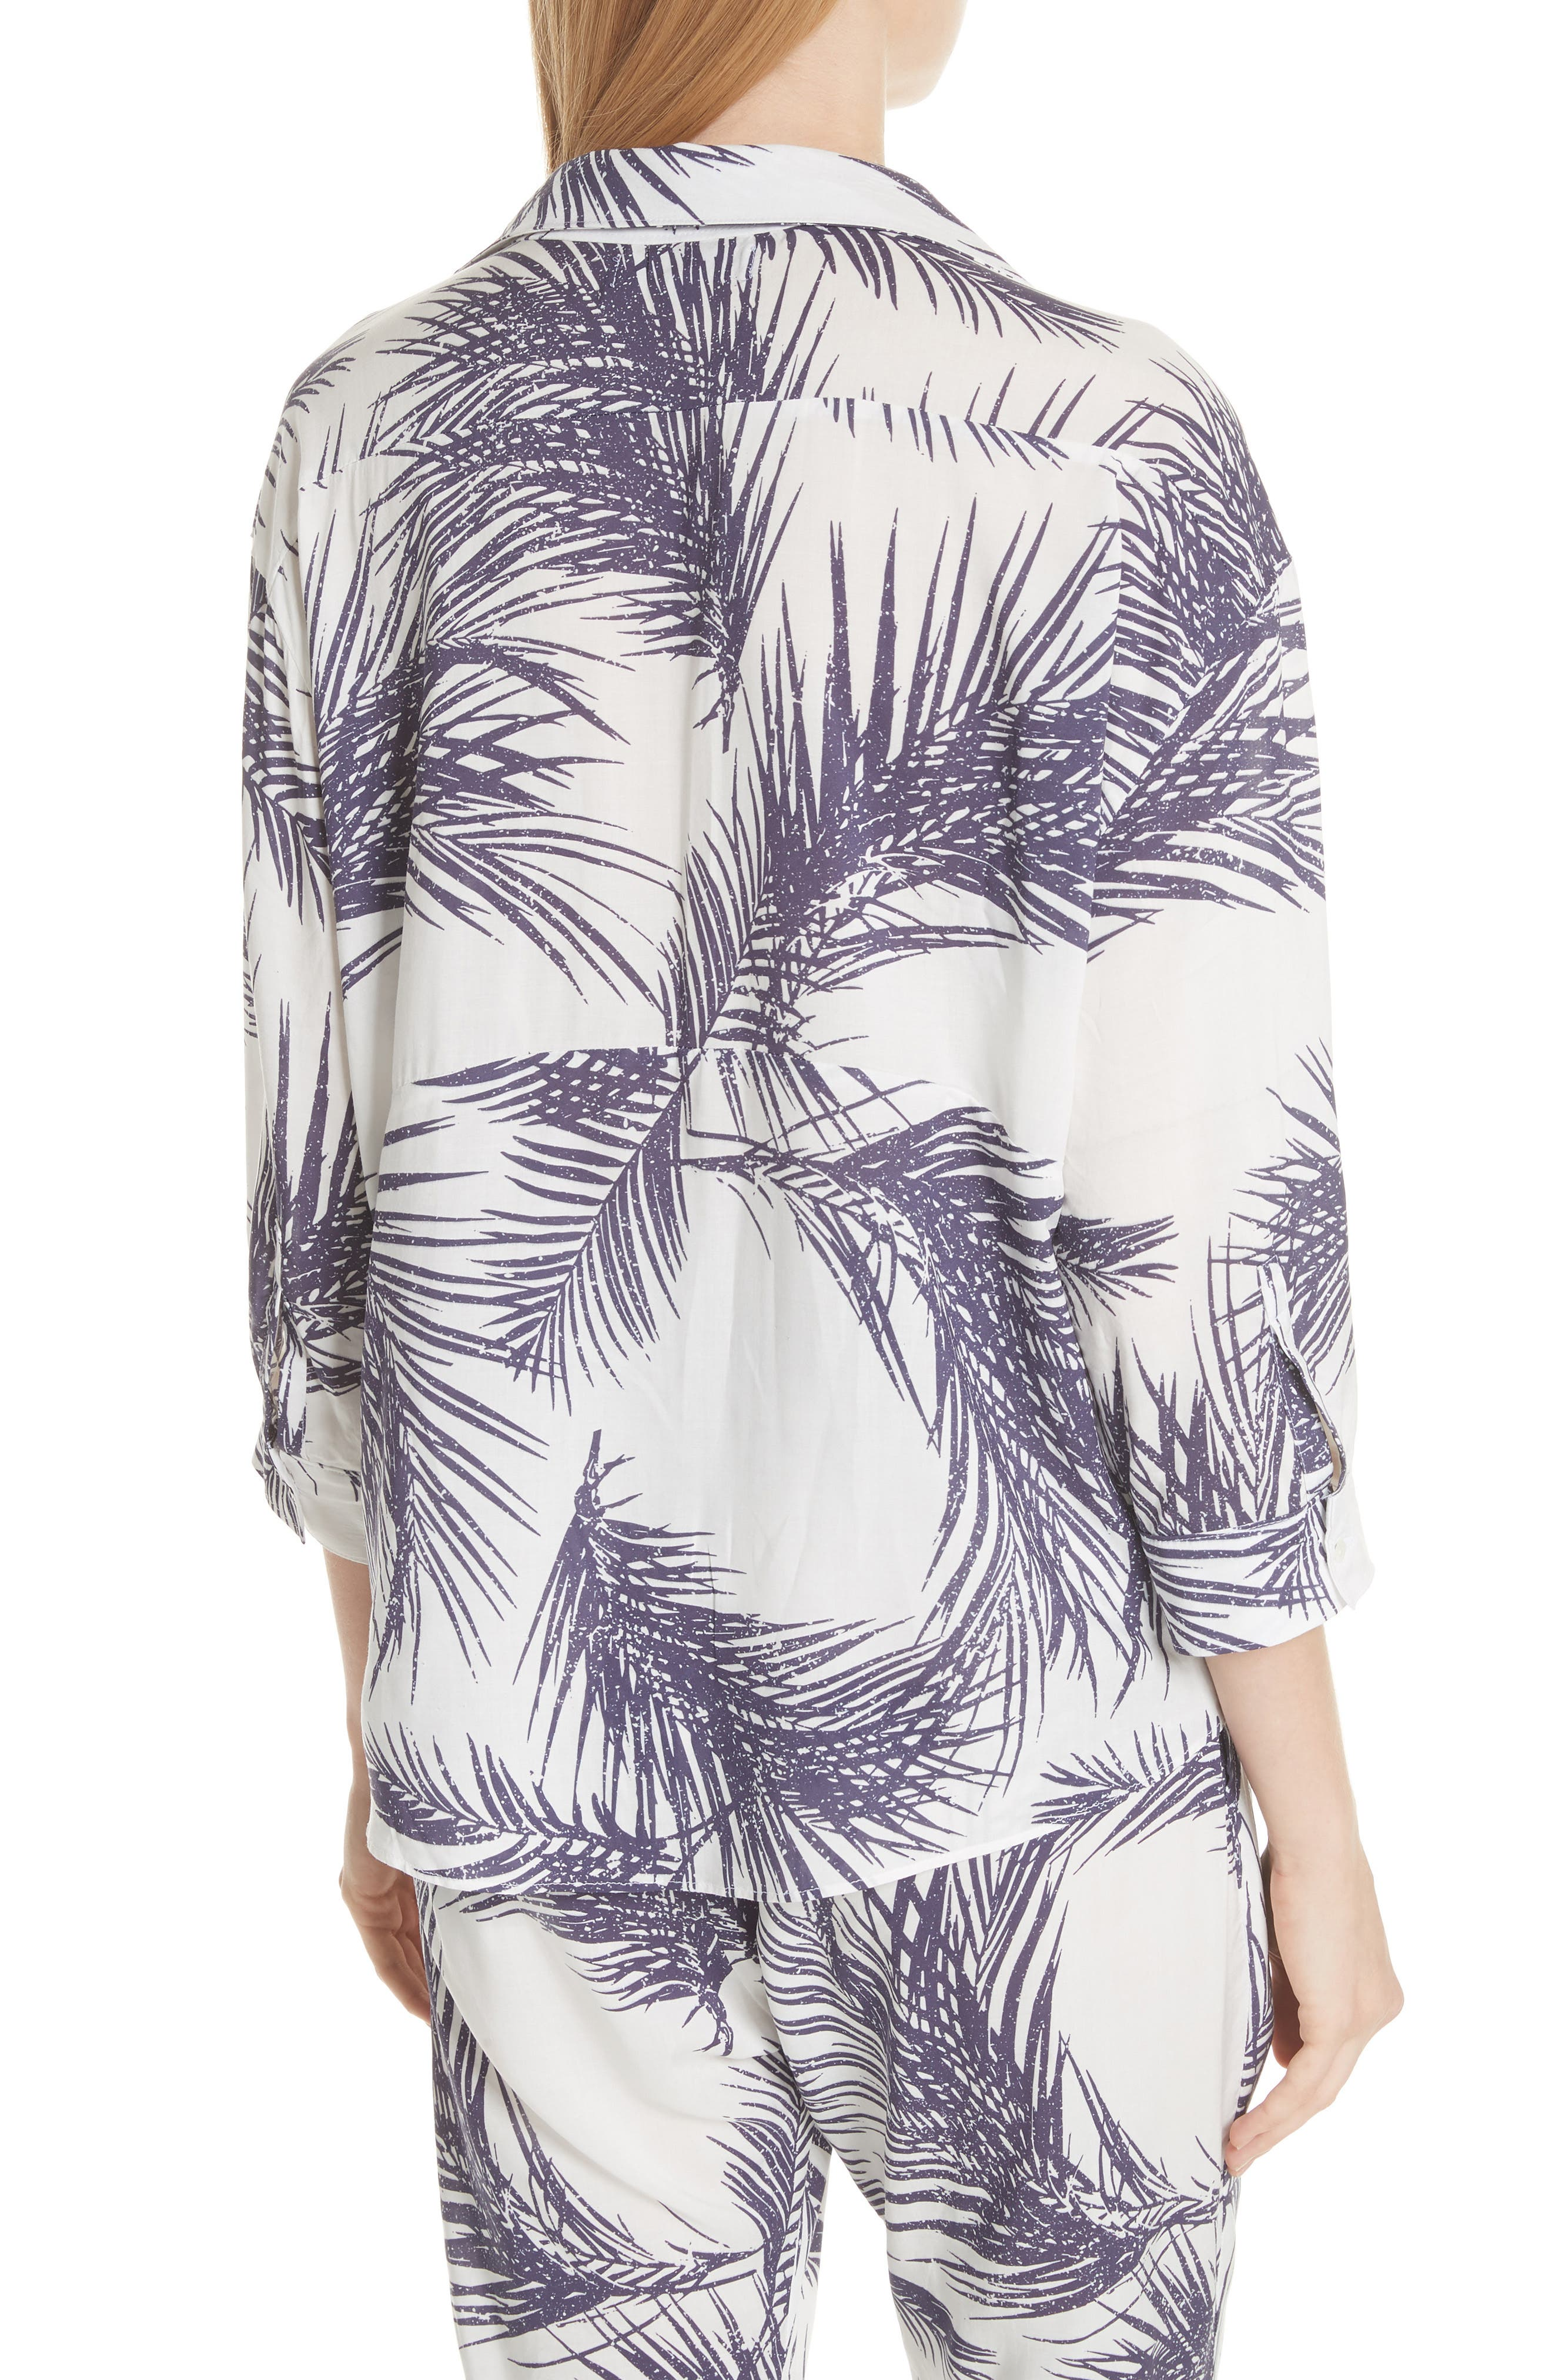 Palm Print Island Shirt,                             Alternate thumbnail 3, color,                             White/ Dark Purple